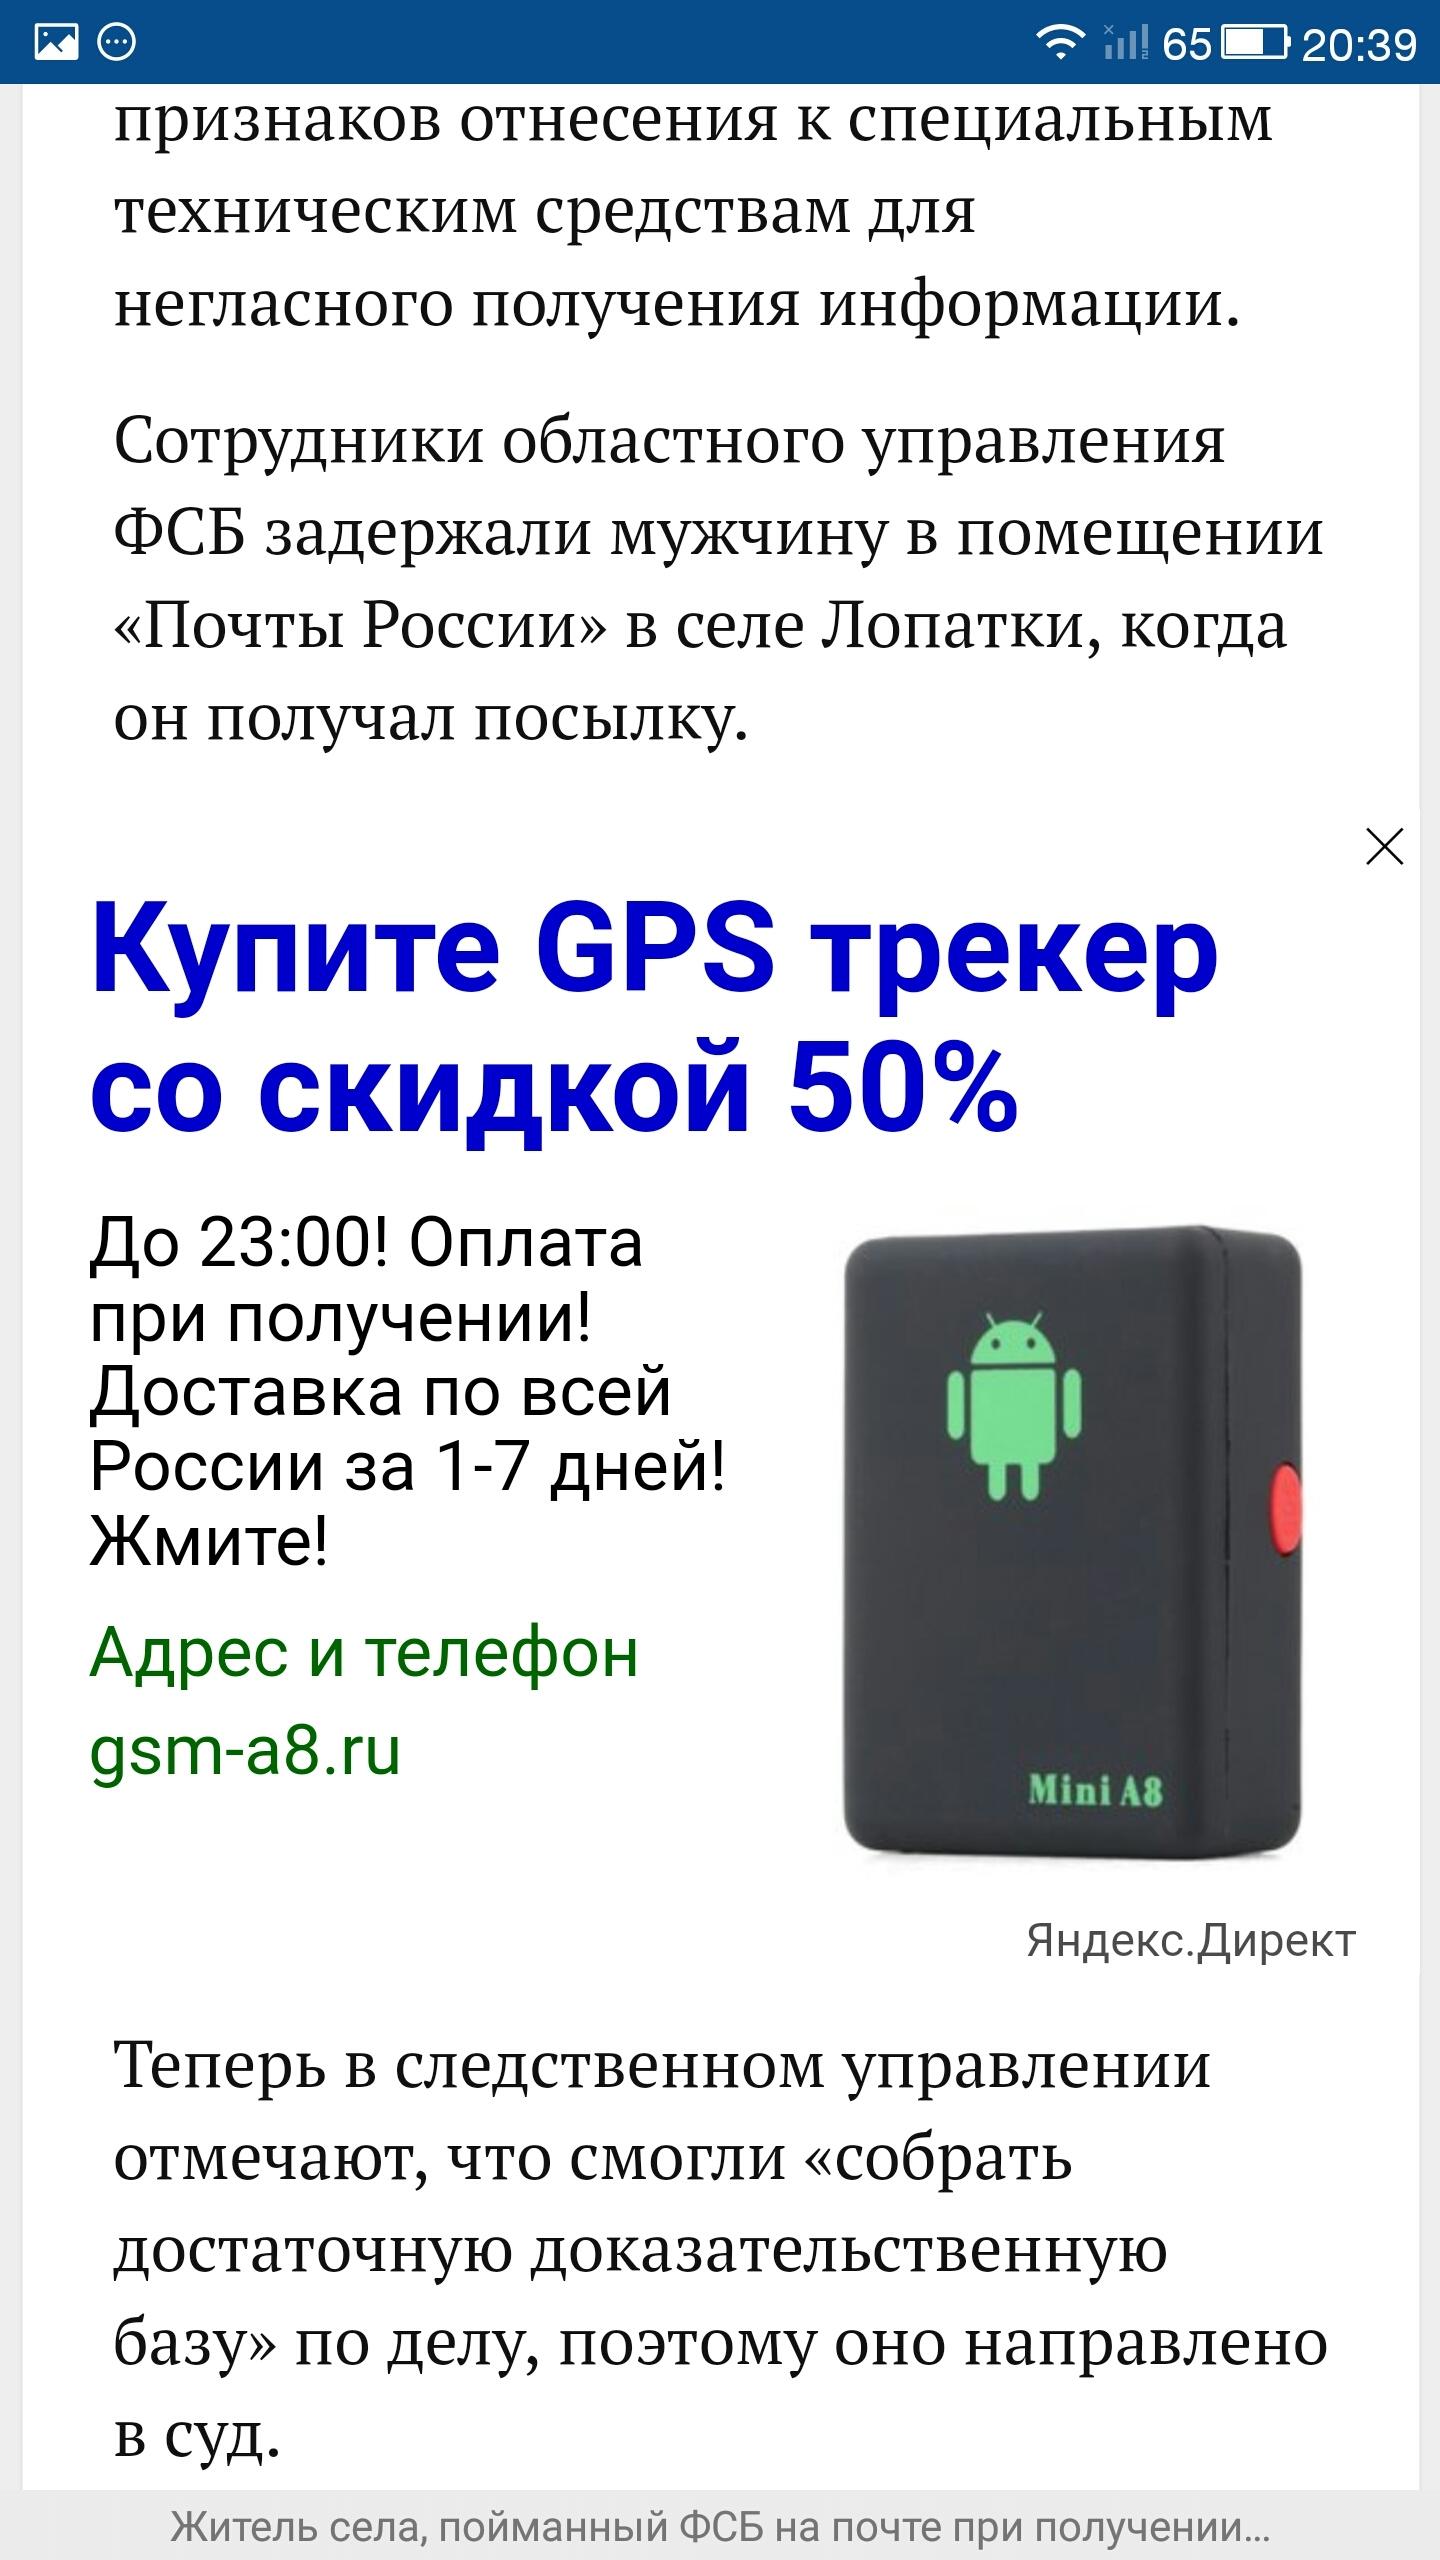 Спасибо, Яндекс.Директ